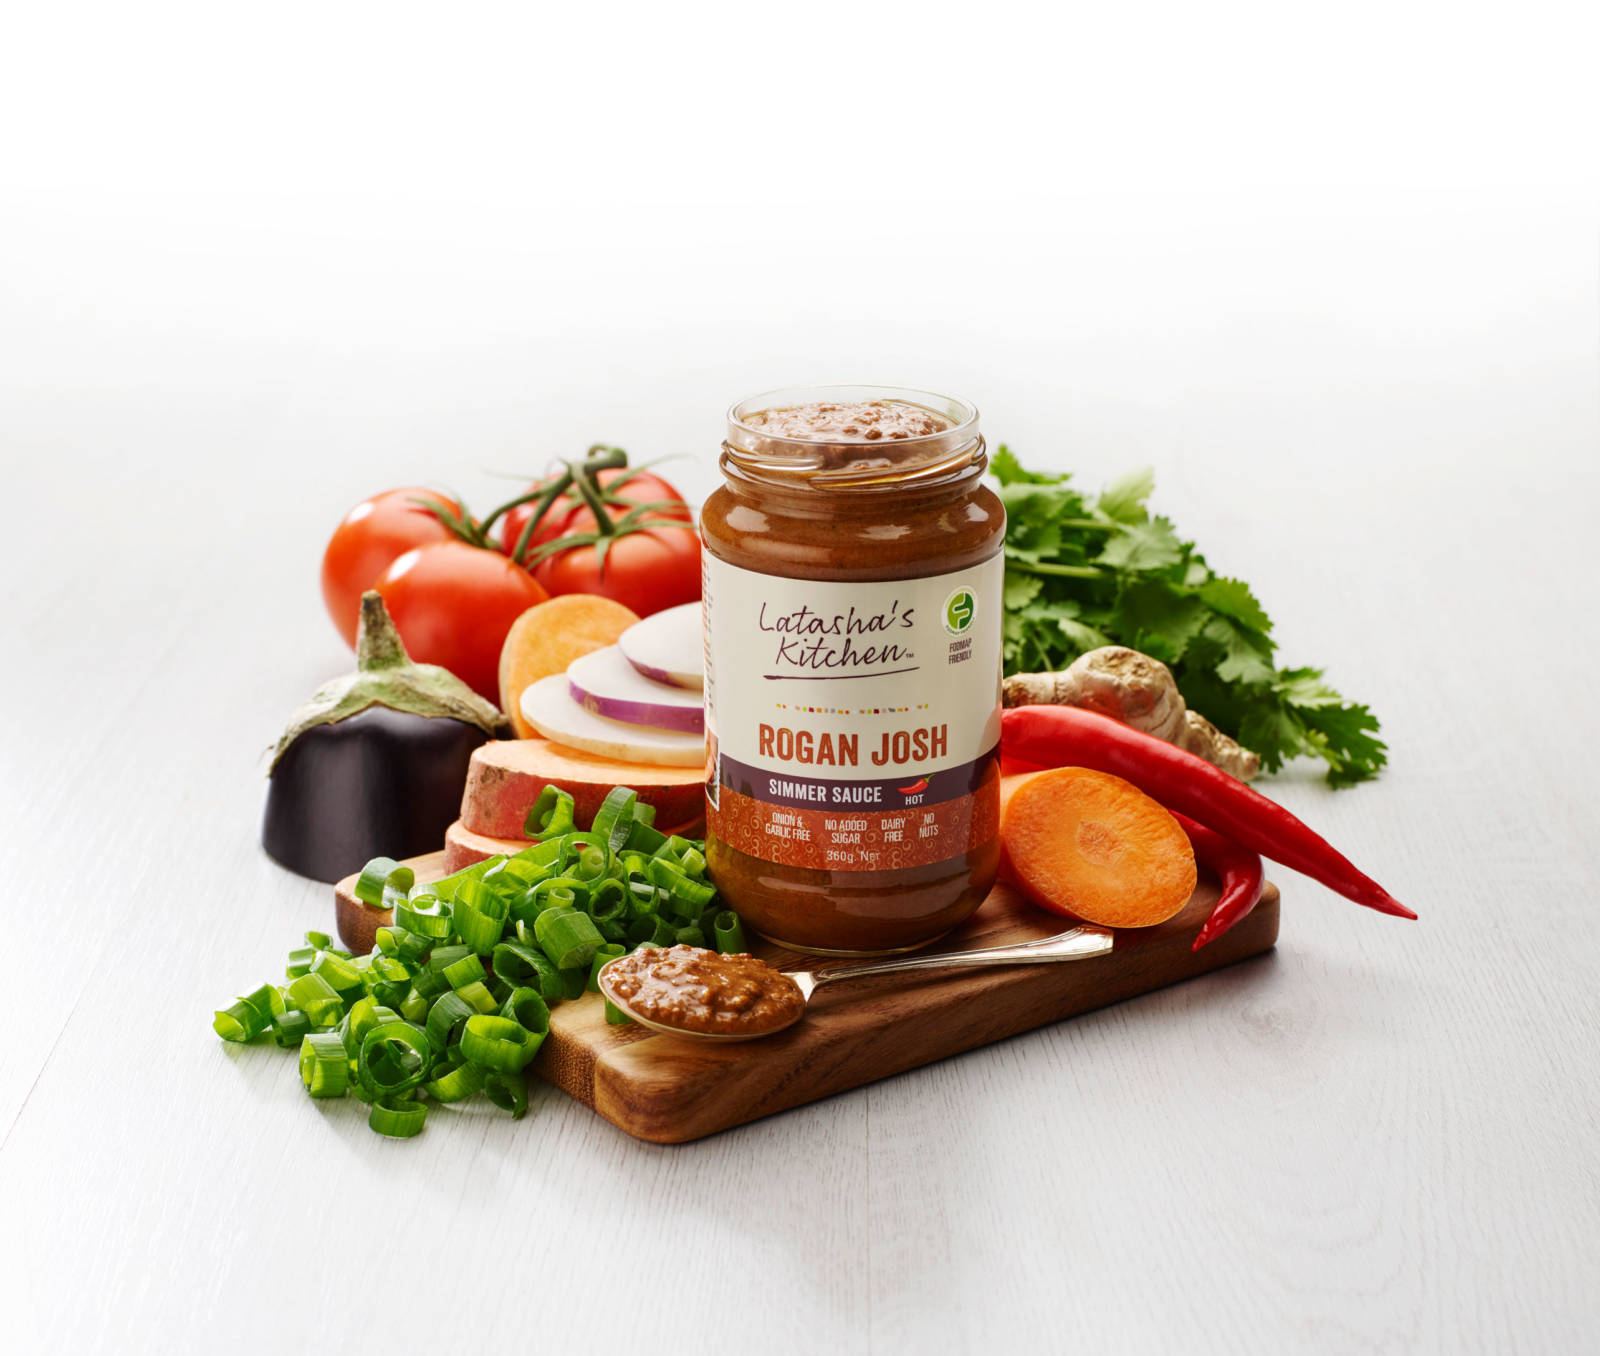 Low FODMAP Simmer Sauces - Rogan Josh by Latasha's Kitchen